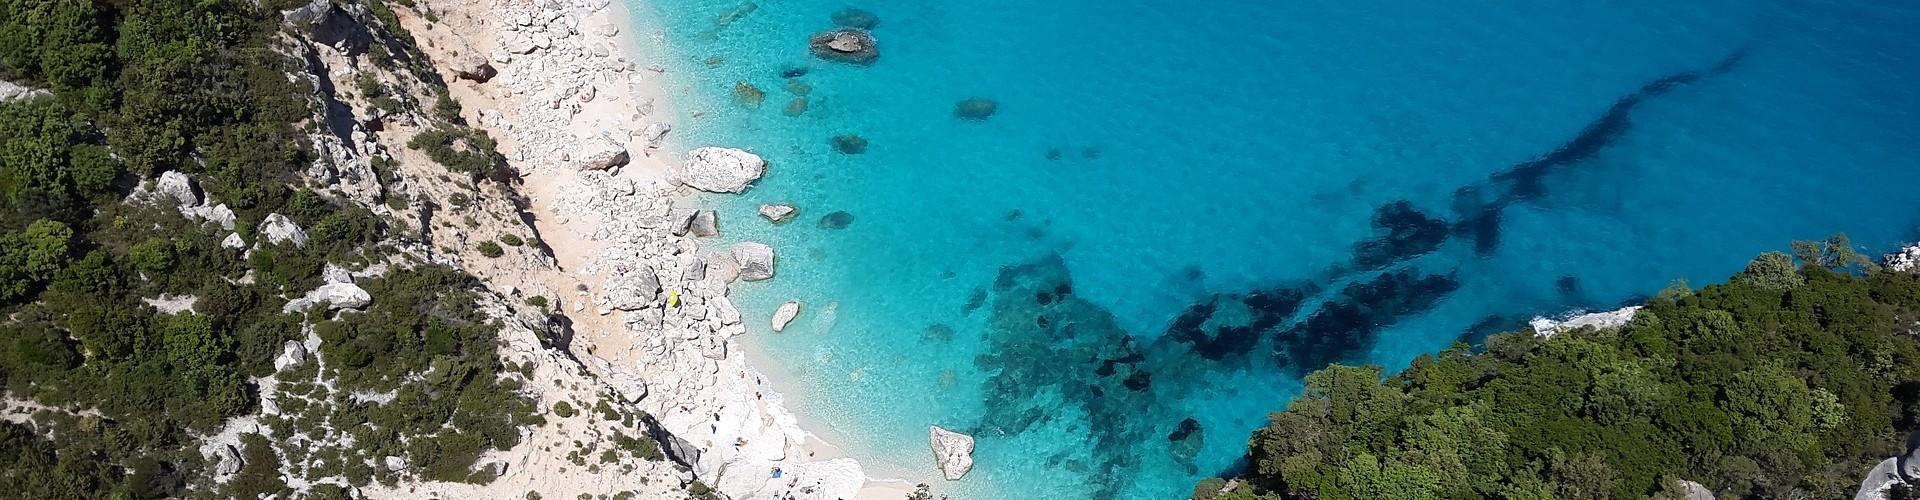 Il Selvaggio Blu trekking Sardegna